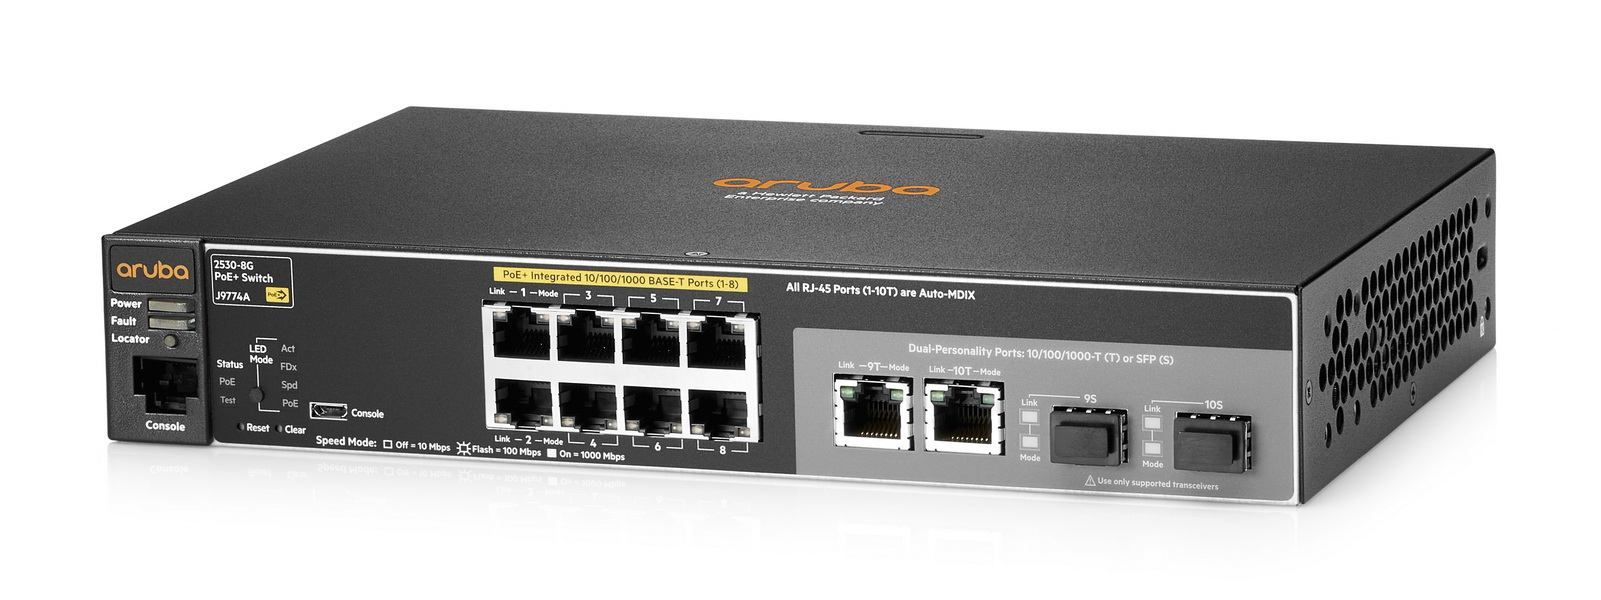 HPE J9774A#ACC - HPE Hewlett Packard Enterprise Aruba 2530 8G PoE+ Managed L2 Gigabit Ethernet [10/100/1000] Power over Ethernet [PoE] 1U Black